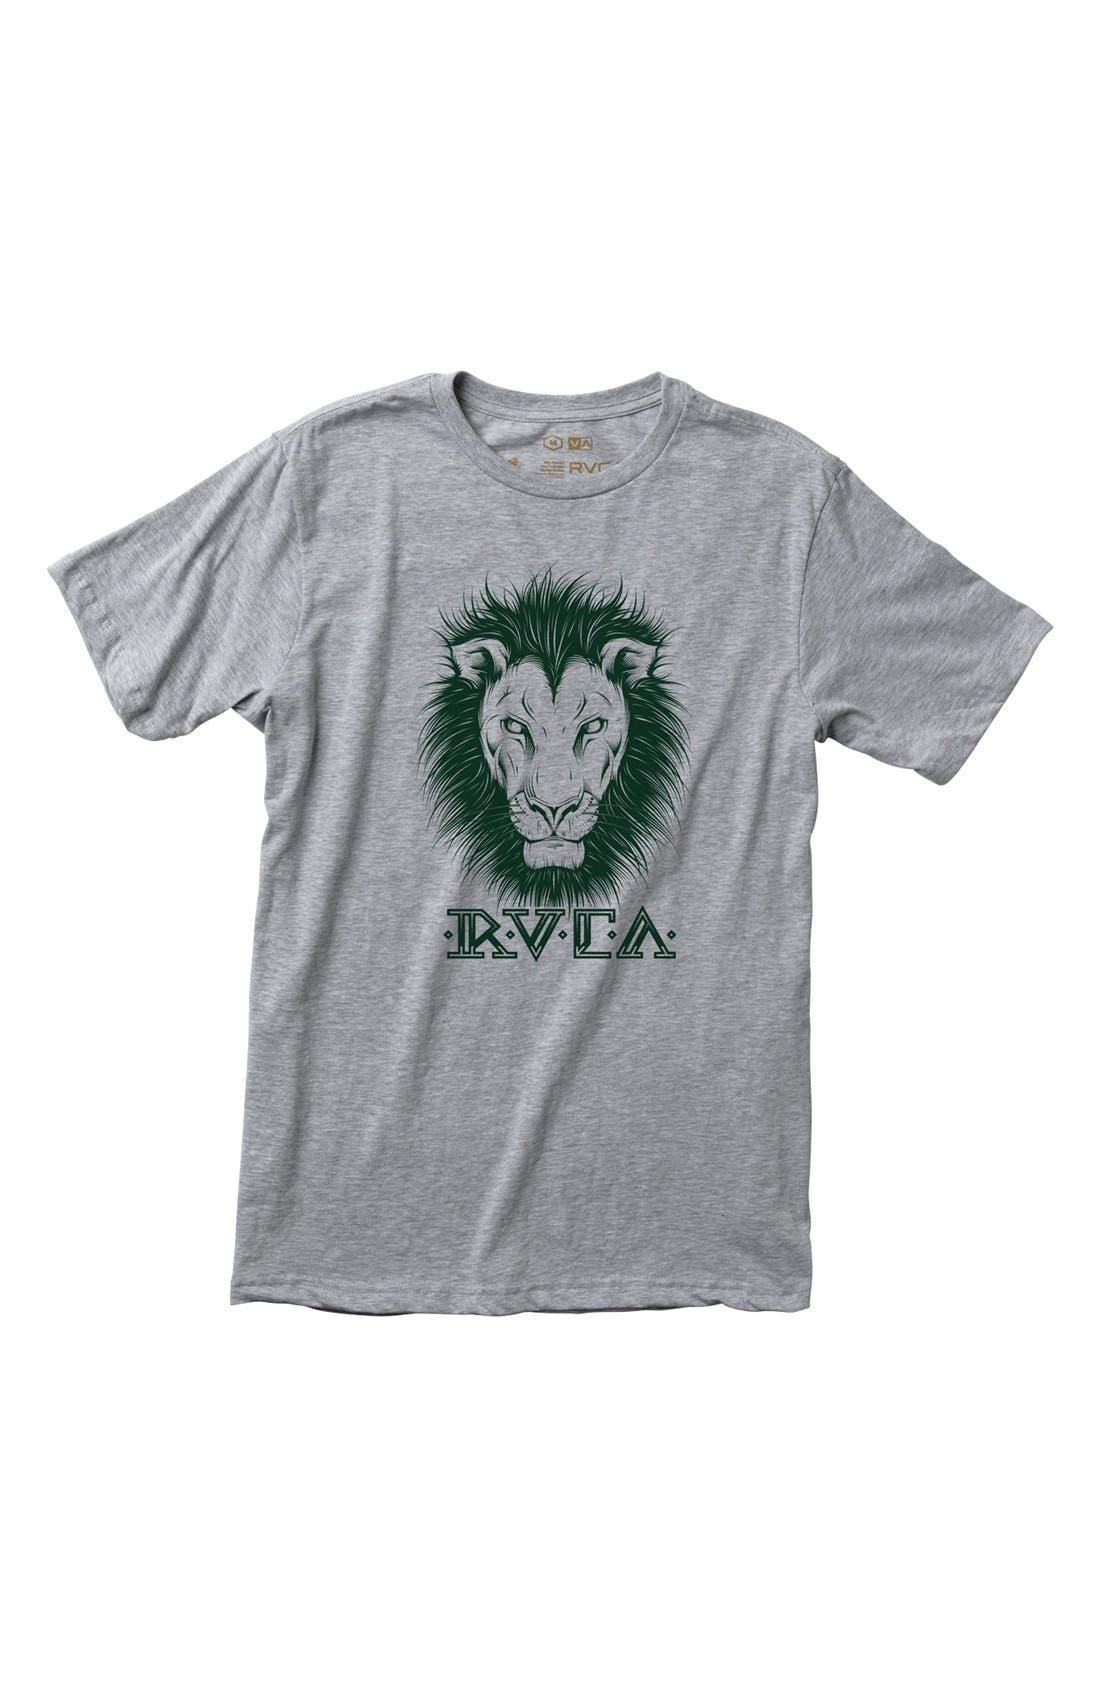 Alternate Image 1 Selected - RVCA 'Lions' T-Shirt (Big Boys)